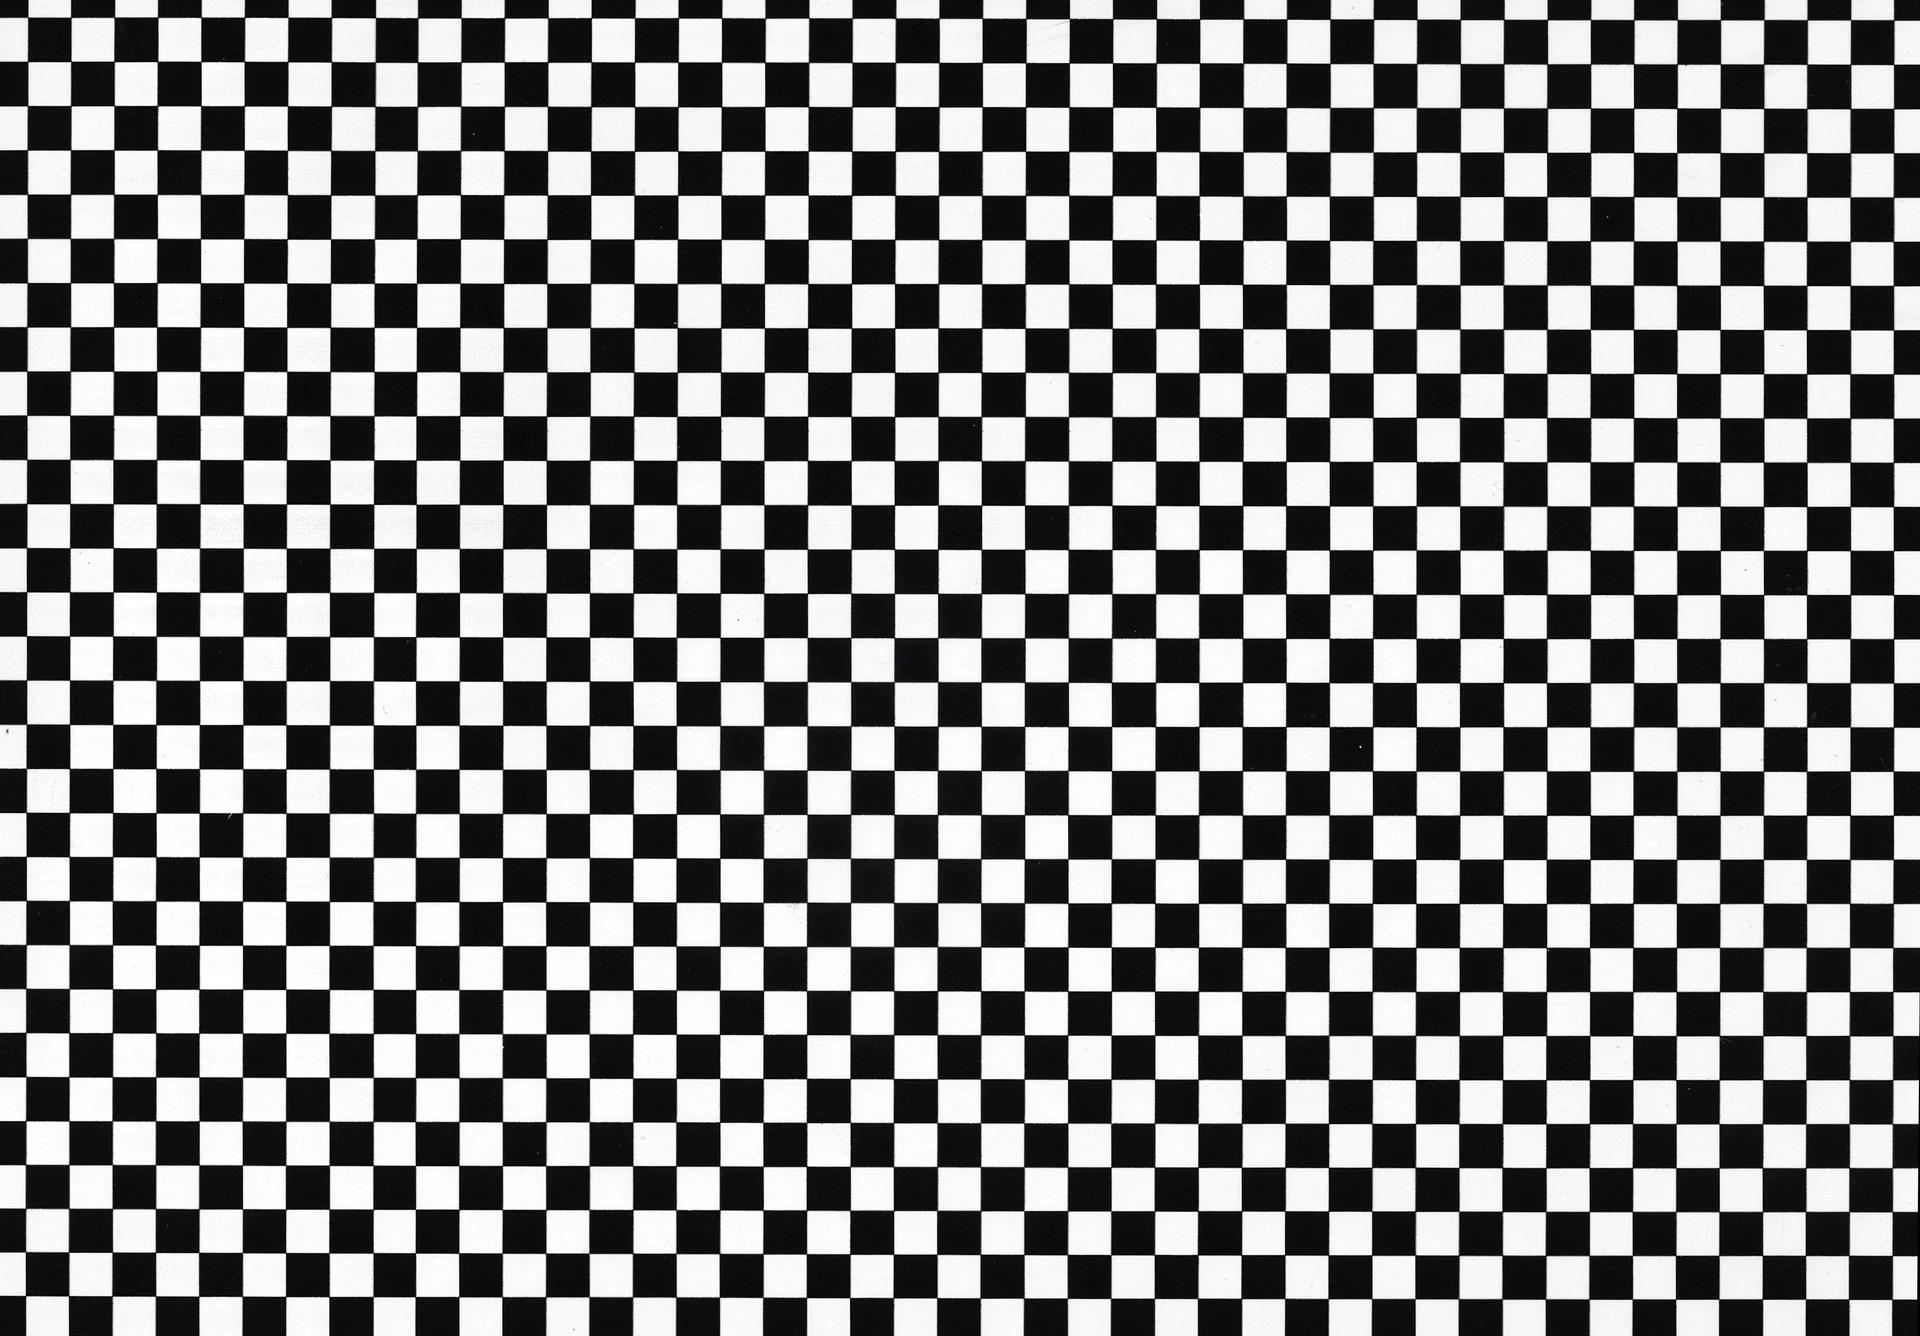 Revetement Adhesif Echecs Noir Et Blanc 1 5 M X 0 45 M Leroy Merlin